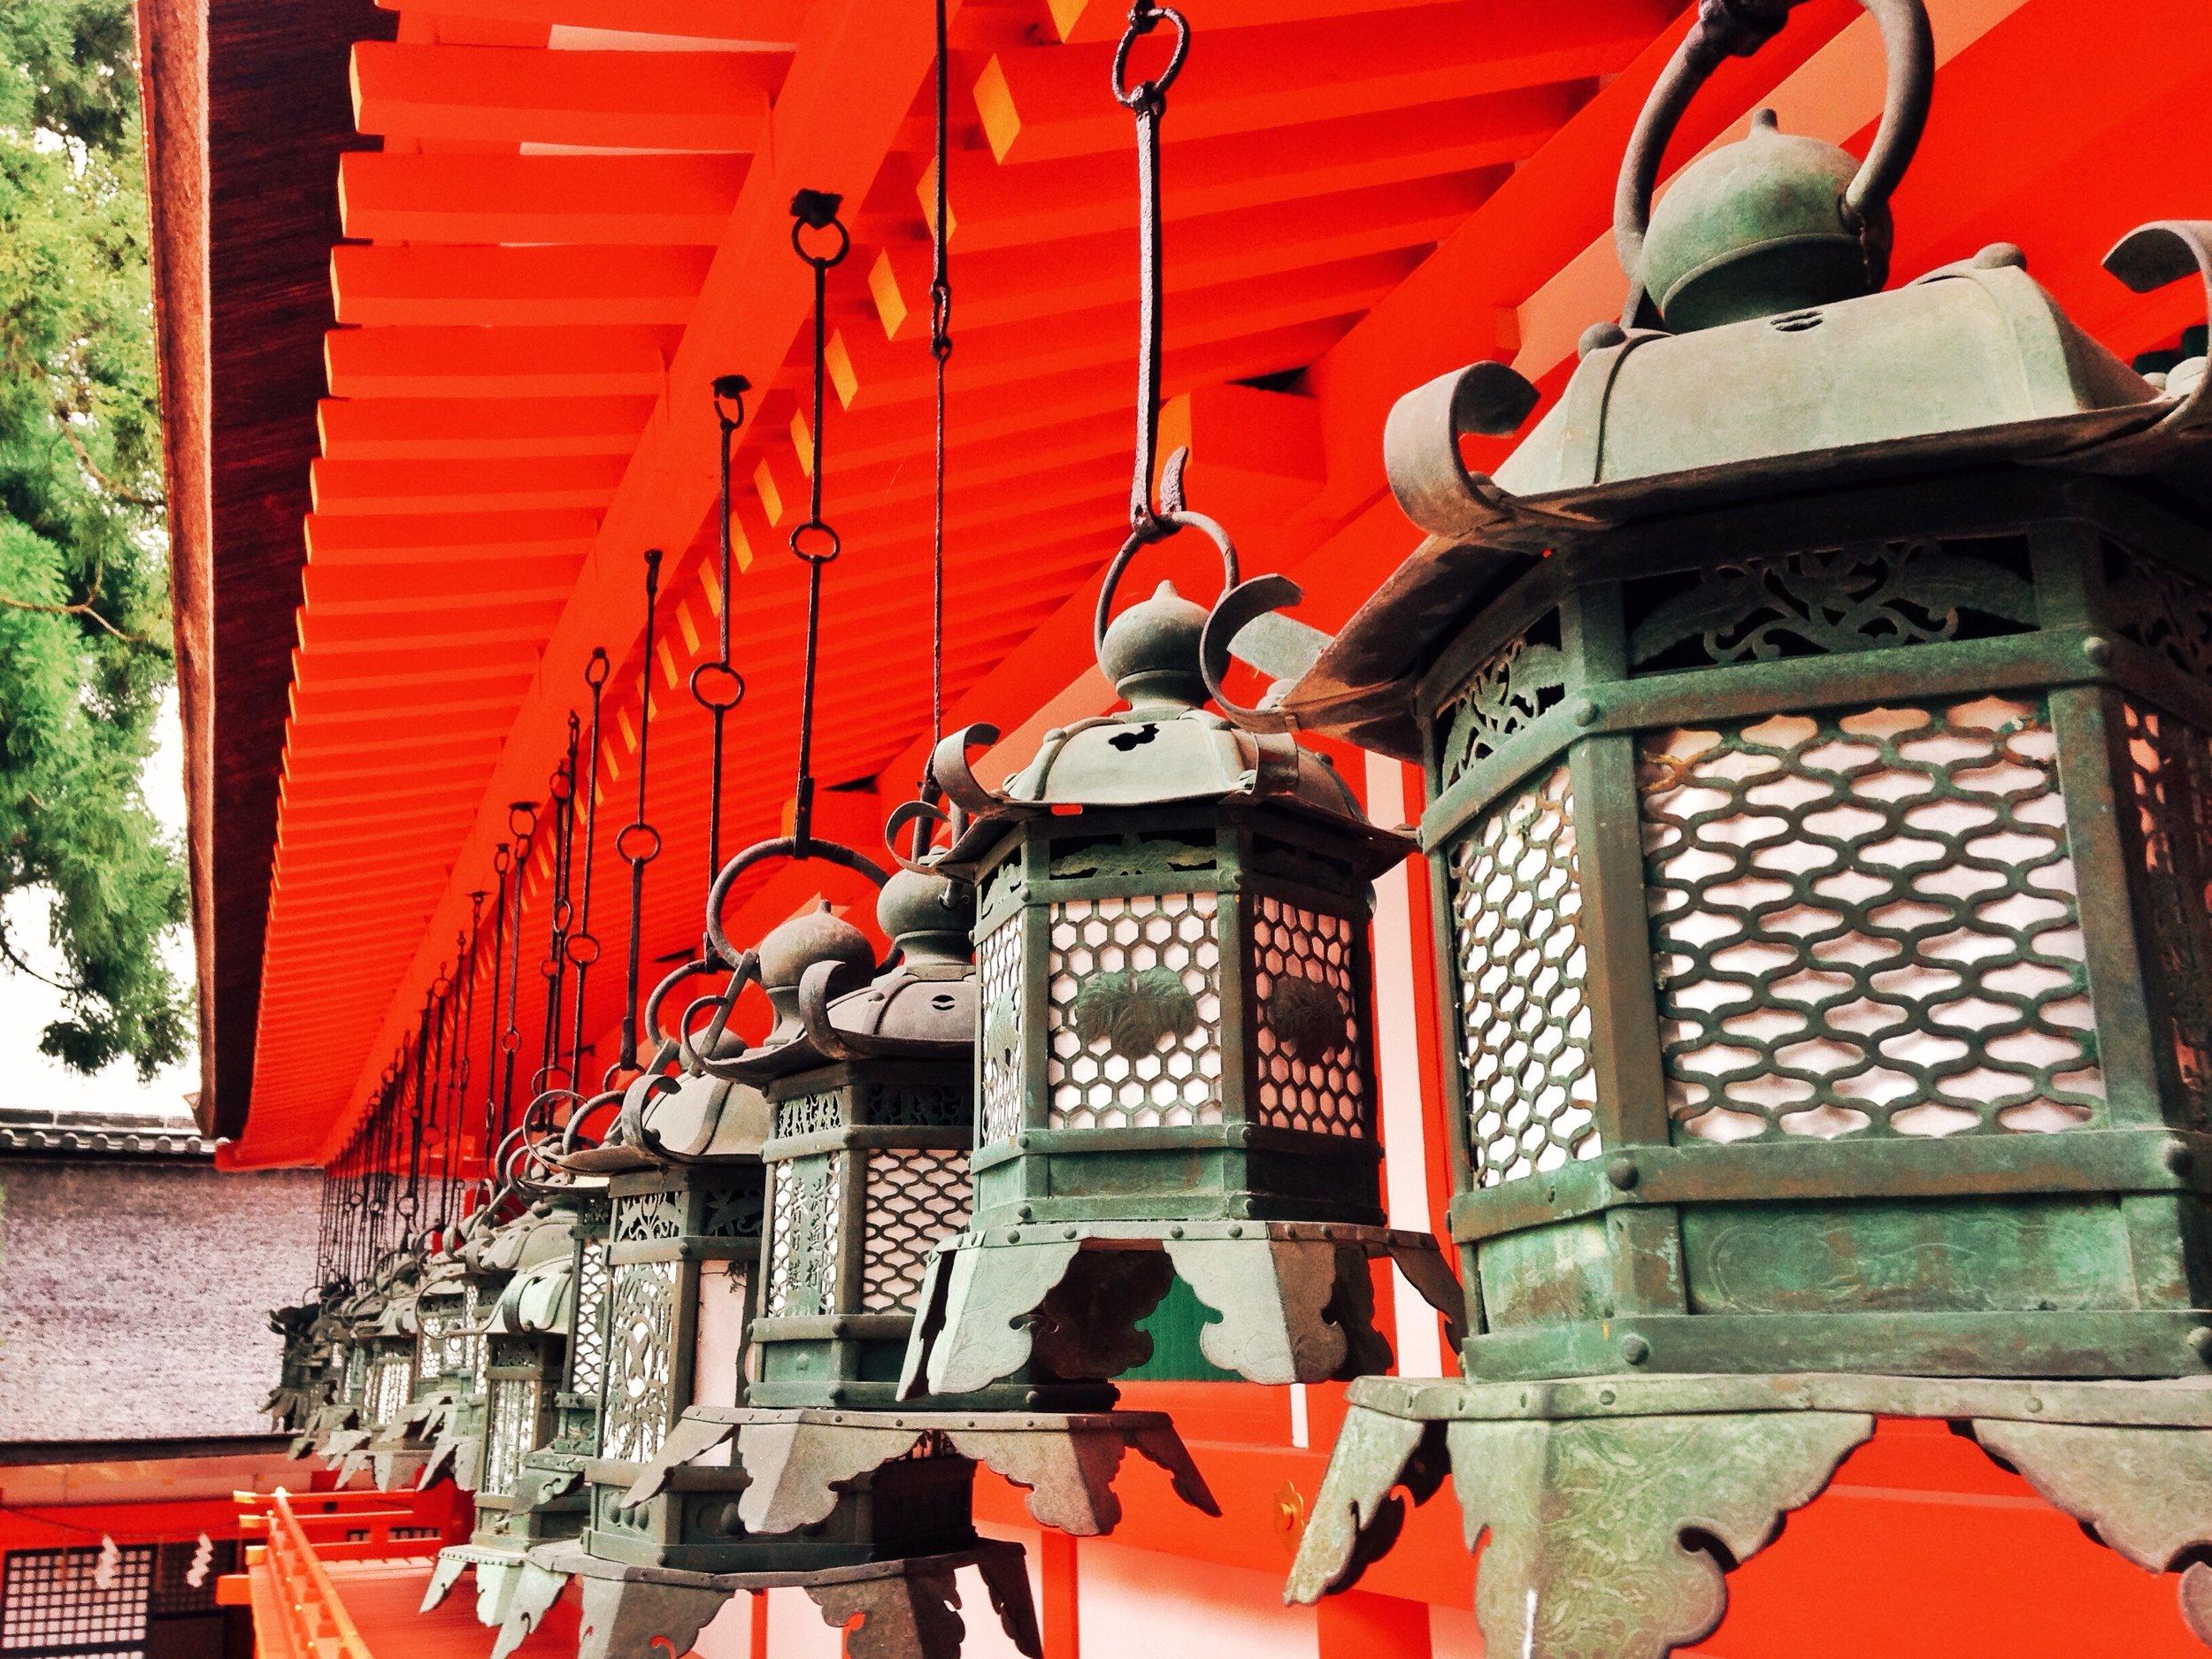 Lanterns from the historical Fushimi-Inari Shrine in Kyoto, Japan.